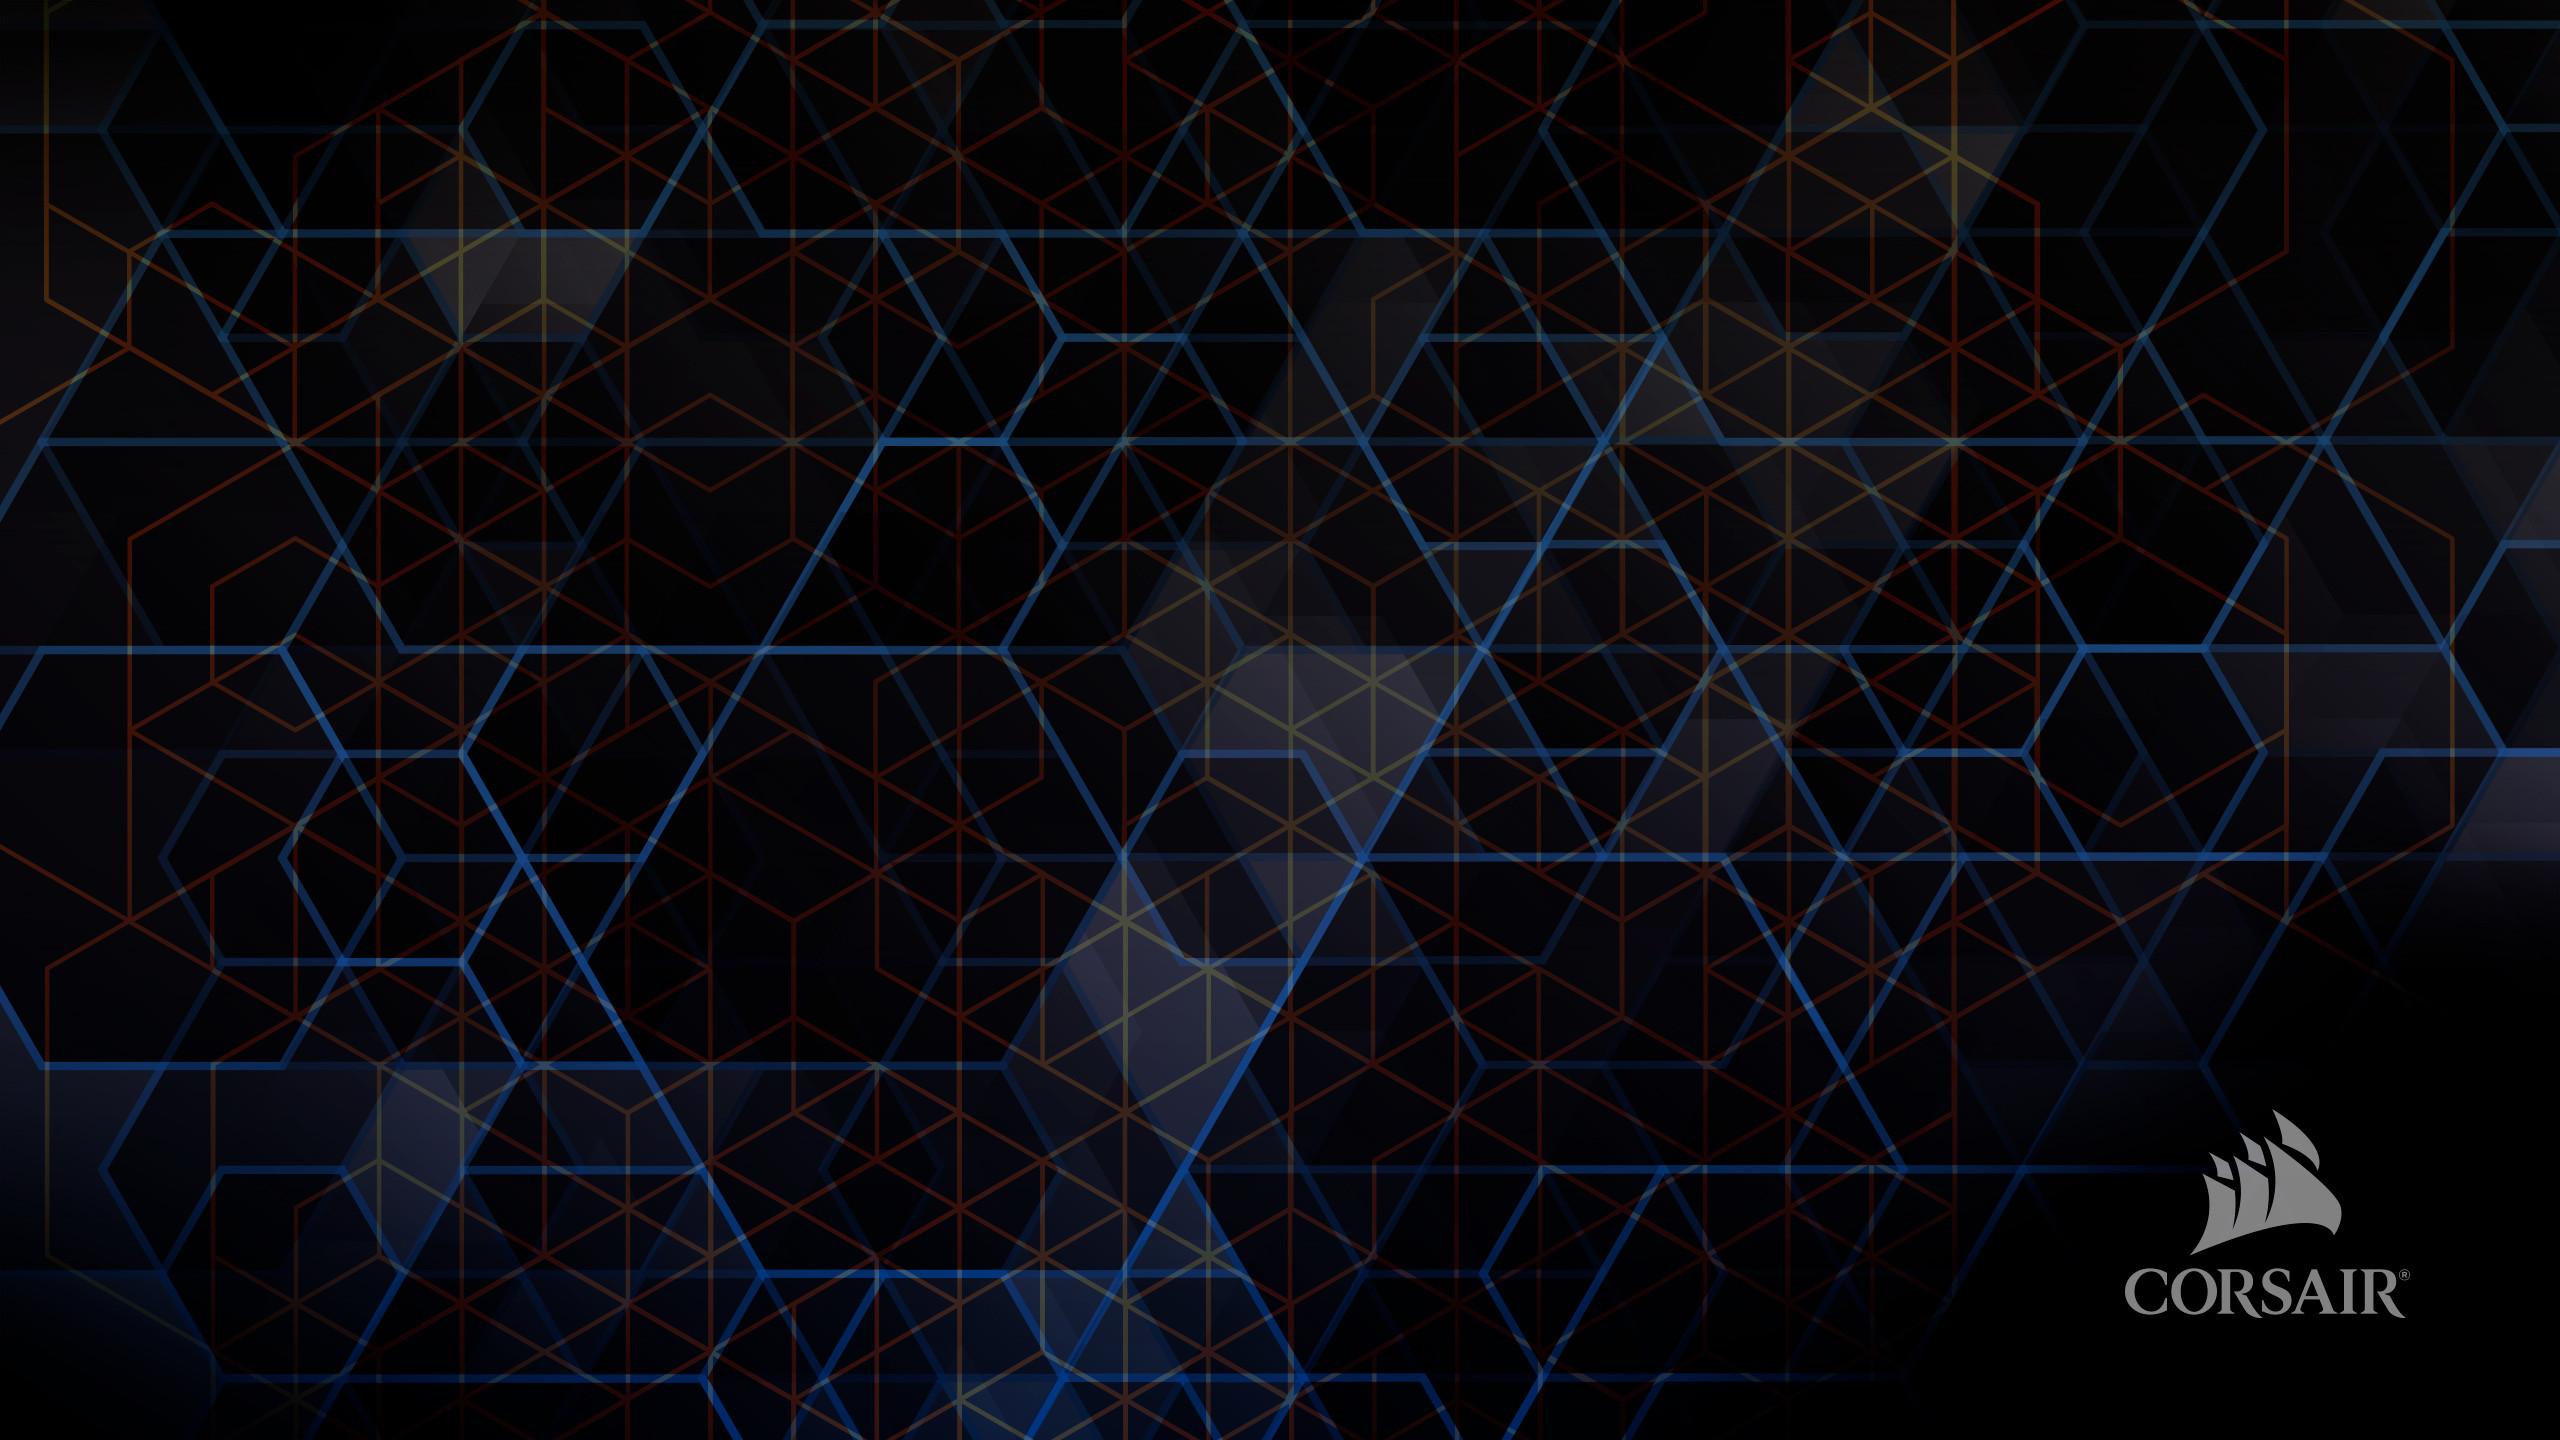 2560x1440 wallpaper 81 images for Sfondi 2560x1440